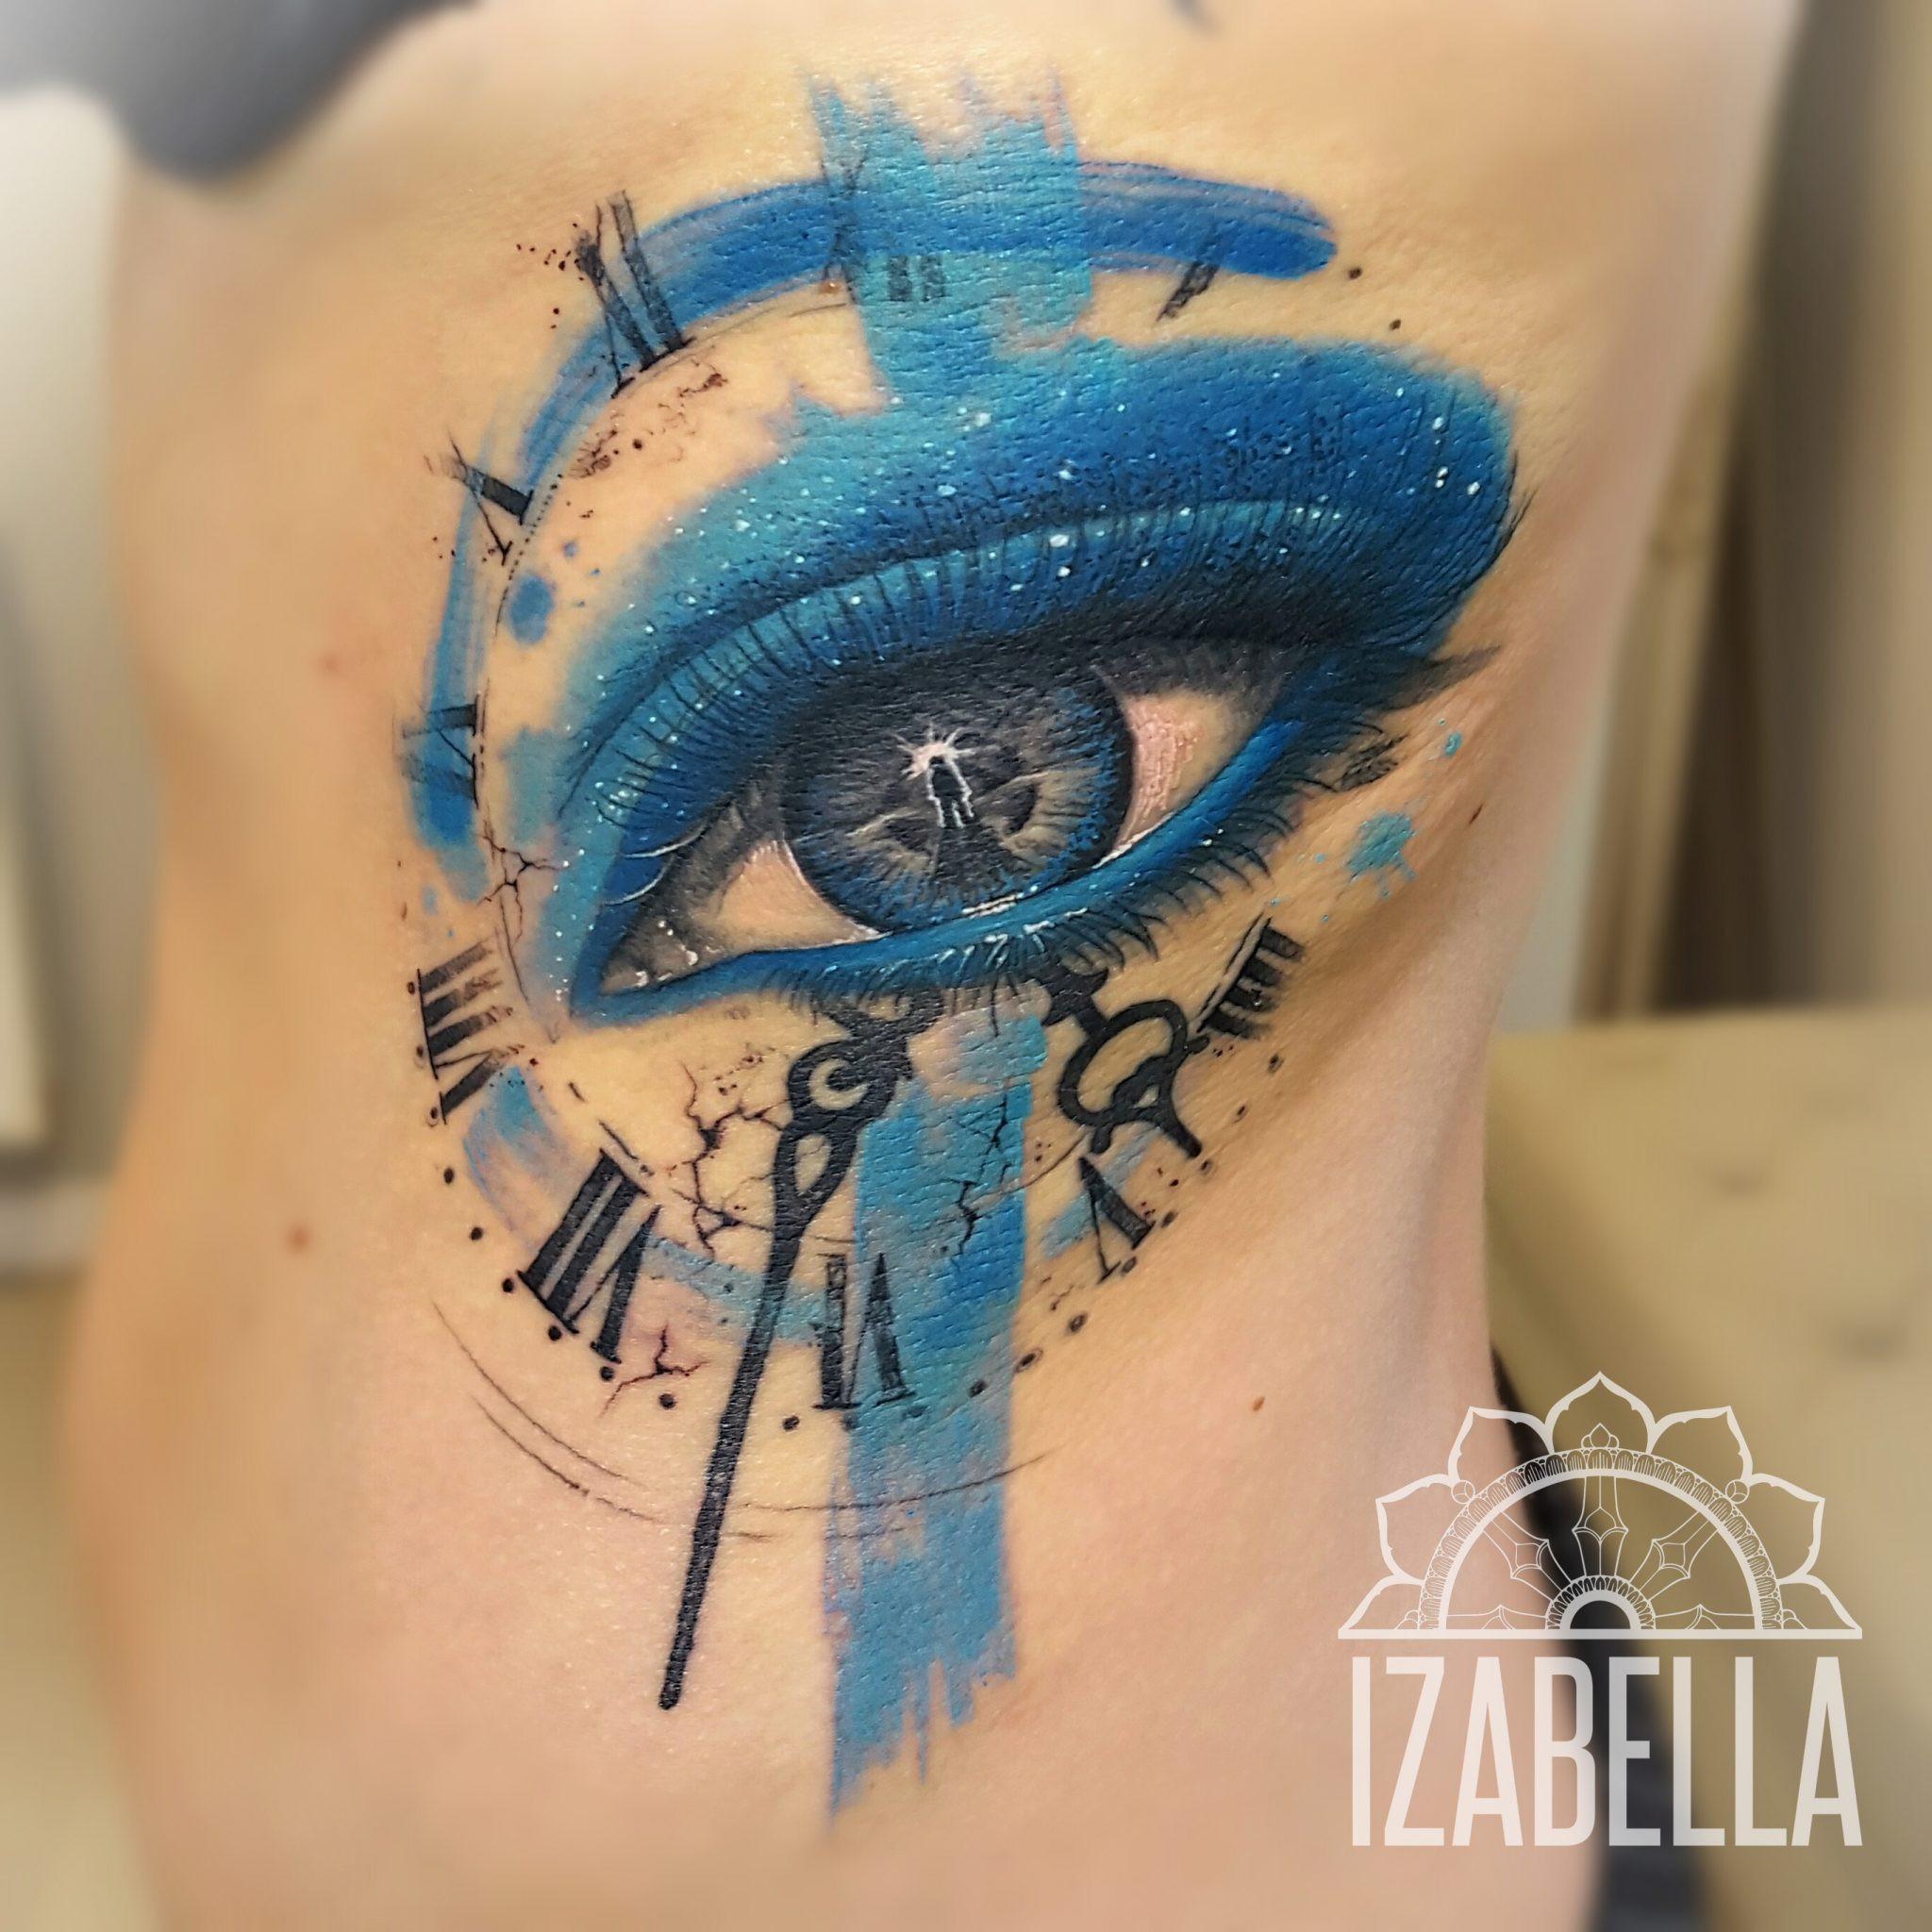 Oko zegar eye clock